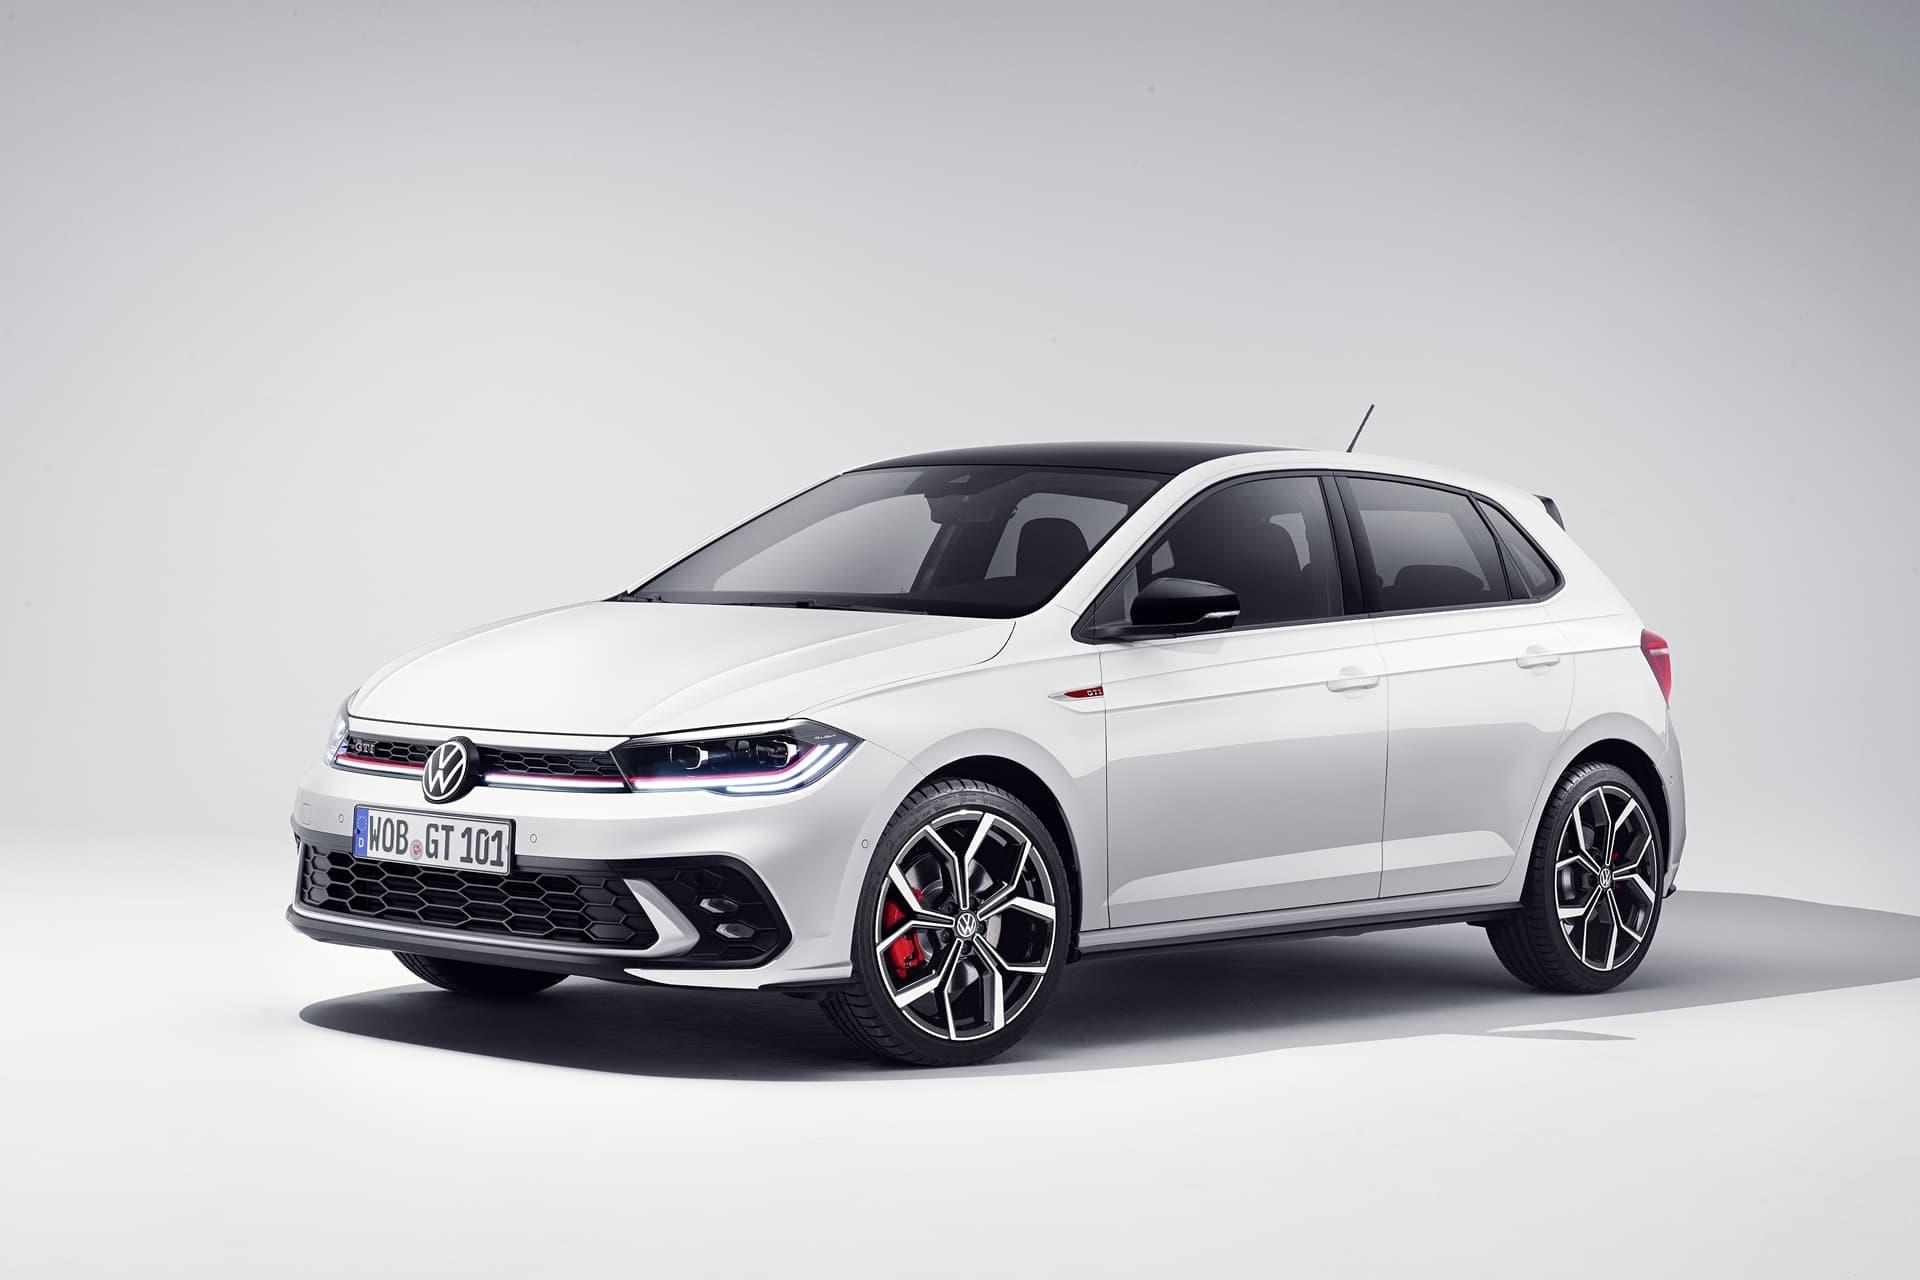 Volkswagen Polo Gti 2022 0621 016